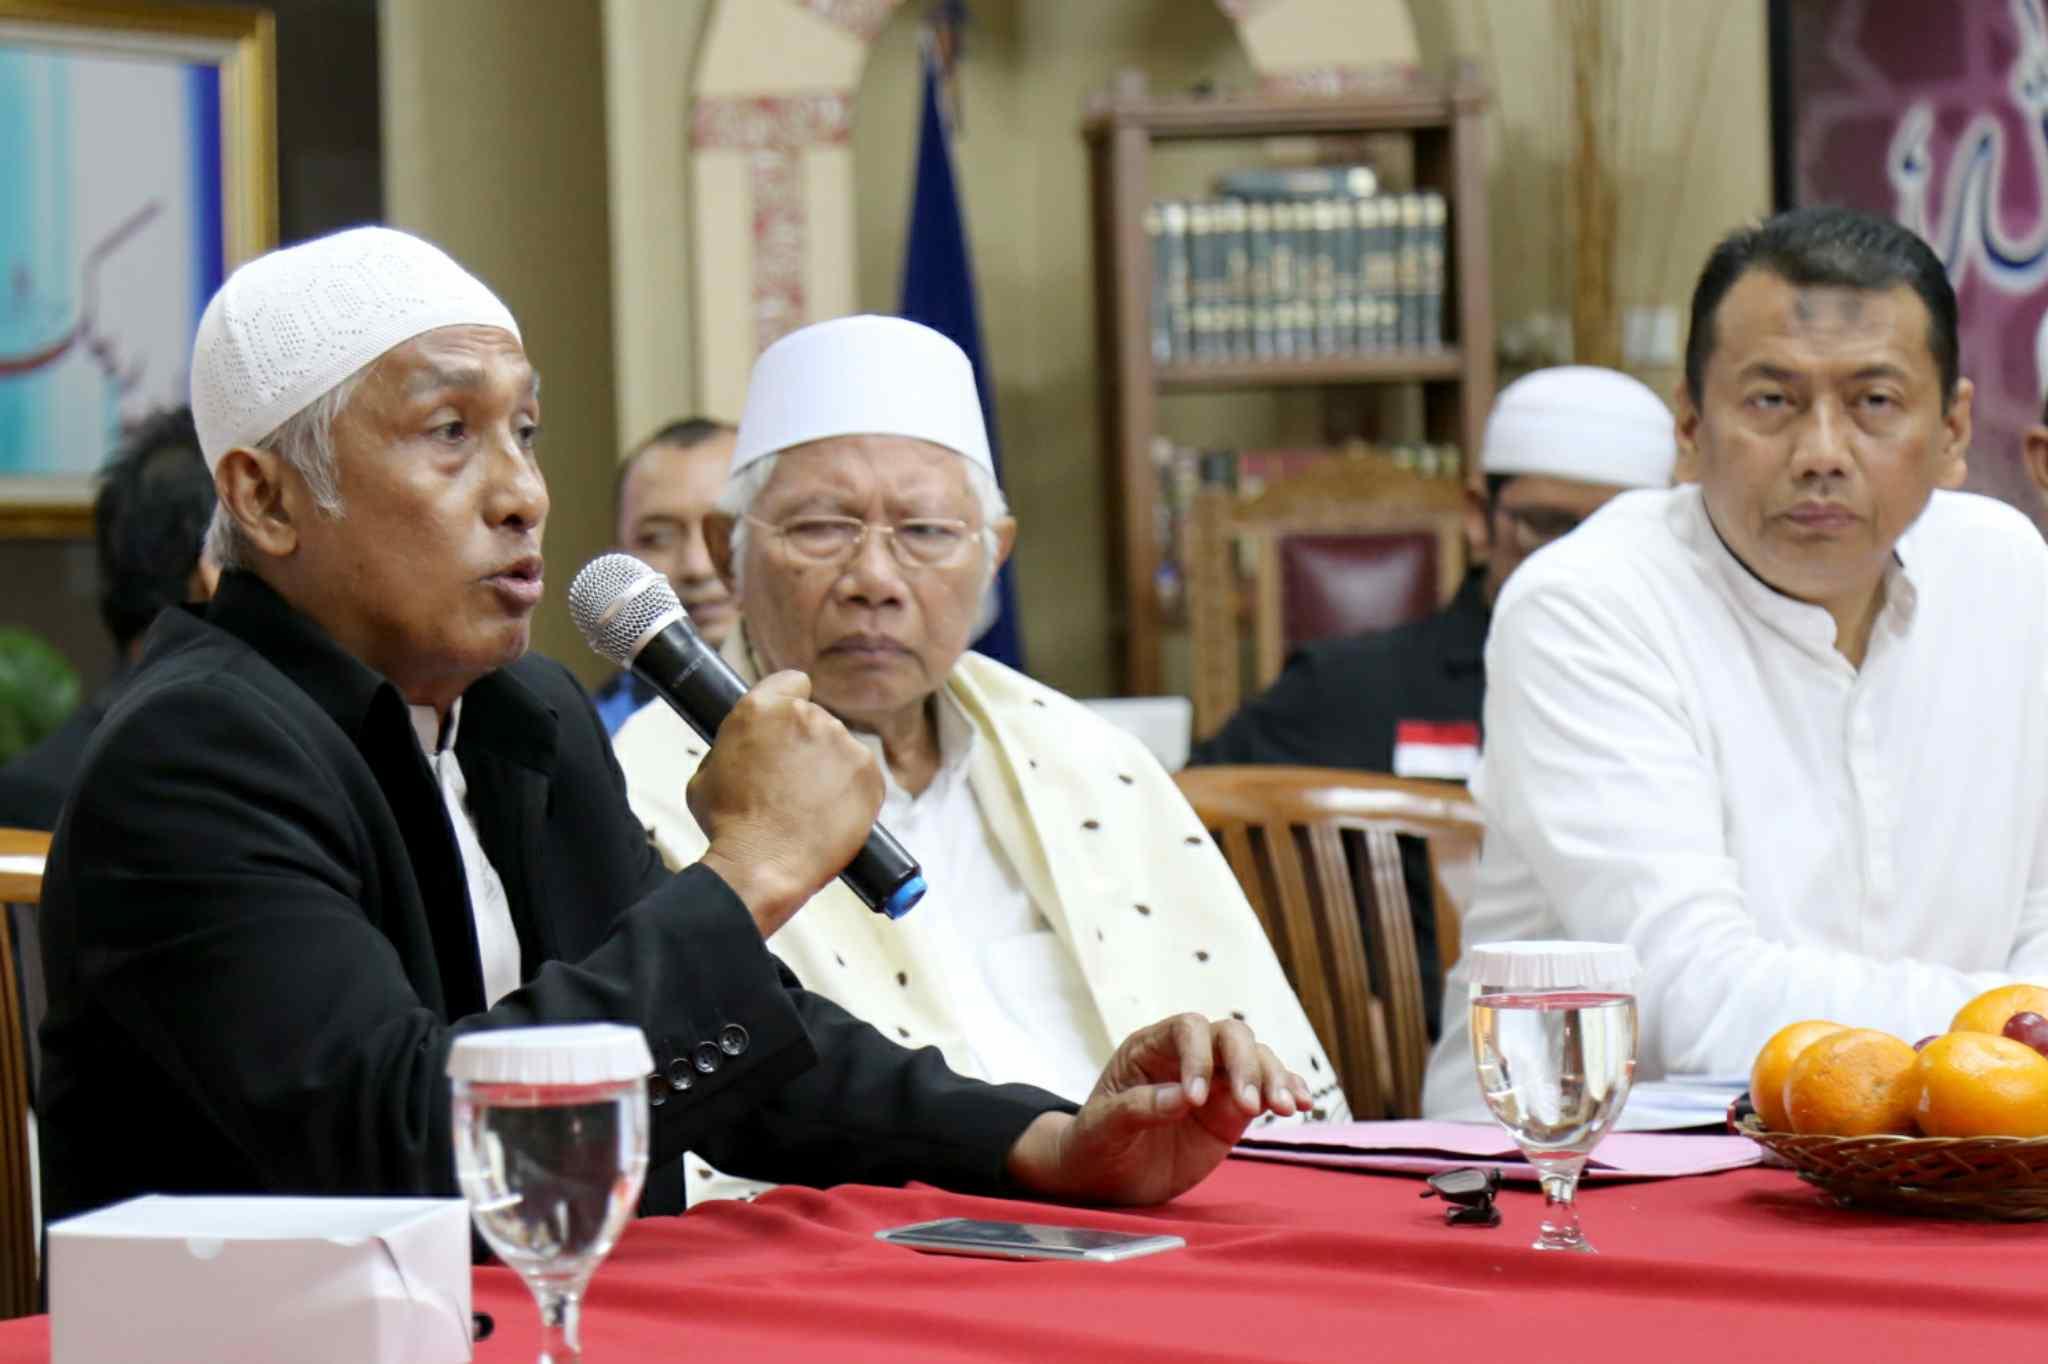 "Kuasa Hukum KH Muhammad Al Khaththath, Kapitra didampingi Pembina GNPF MUI Jakarta, KH Abdul Rasyid dan Anggota Tim Pengacara Muslim (TPM), Achmad Michdan saat konferensi pers ""Bebaskan KH Muhammad Al Khaththath"" di AQL Islamic Center Jalan Tebet Utara, Jakarta Selatan, Senin (3/4). Pimpinan GNPF MUI, Pimpinan Ormas dan Tokoh Masyarakat menyerukan aparat kepolisian agar membebaskan KH Muhammad Al Khaththath dari tahanan dan tuduhan makar. Karena selaku pimpinan aksi 313 sekaligus Sekjen FUI dengan tuduhan makar merupakan bentuk penggunaan hukum instrumen of power, yang sama sekali tidak berkeadilan. AKTUAL/Tino Oktaviano"